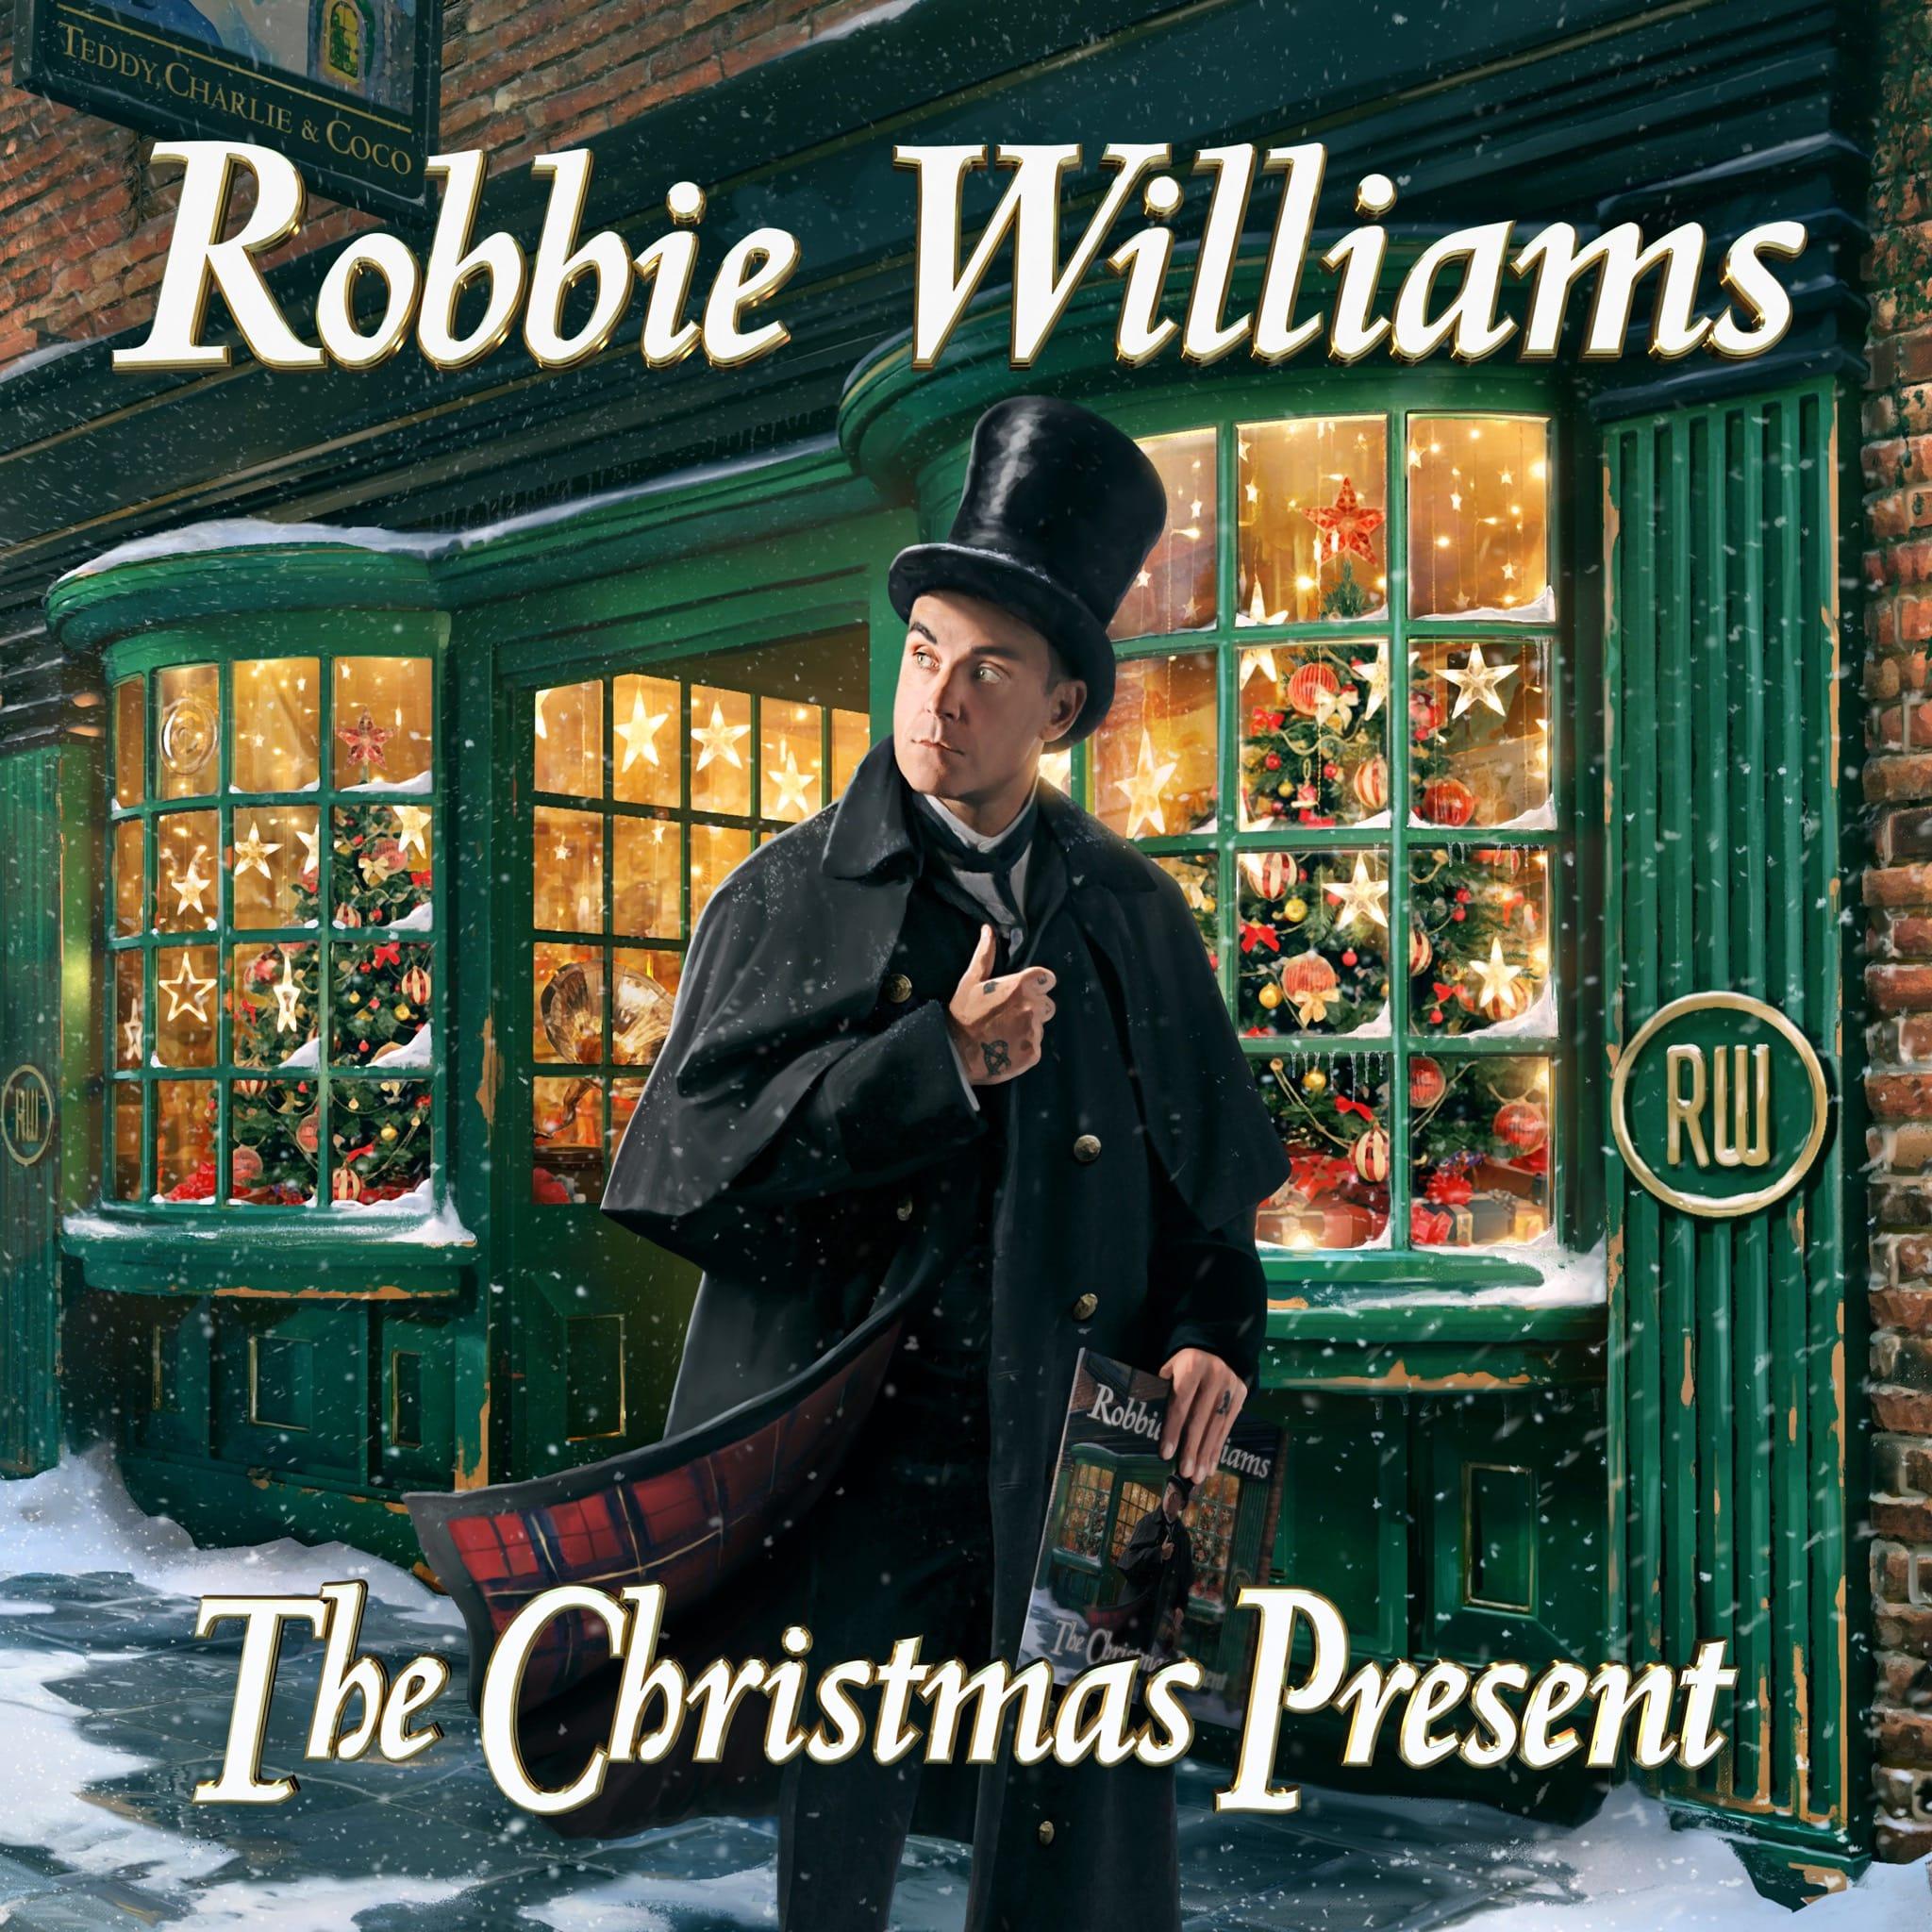 ROBBIE WILLIAMS cover pochette album THE CHRISTMAS PRESENT musique